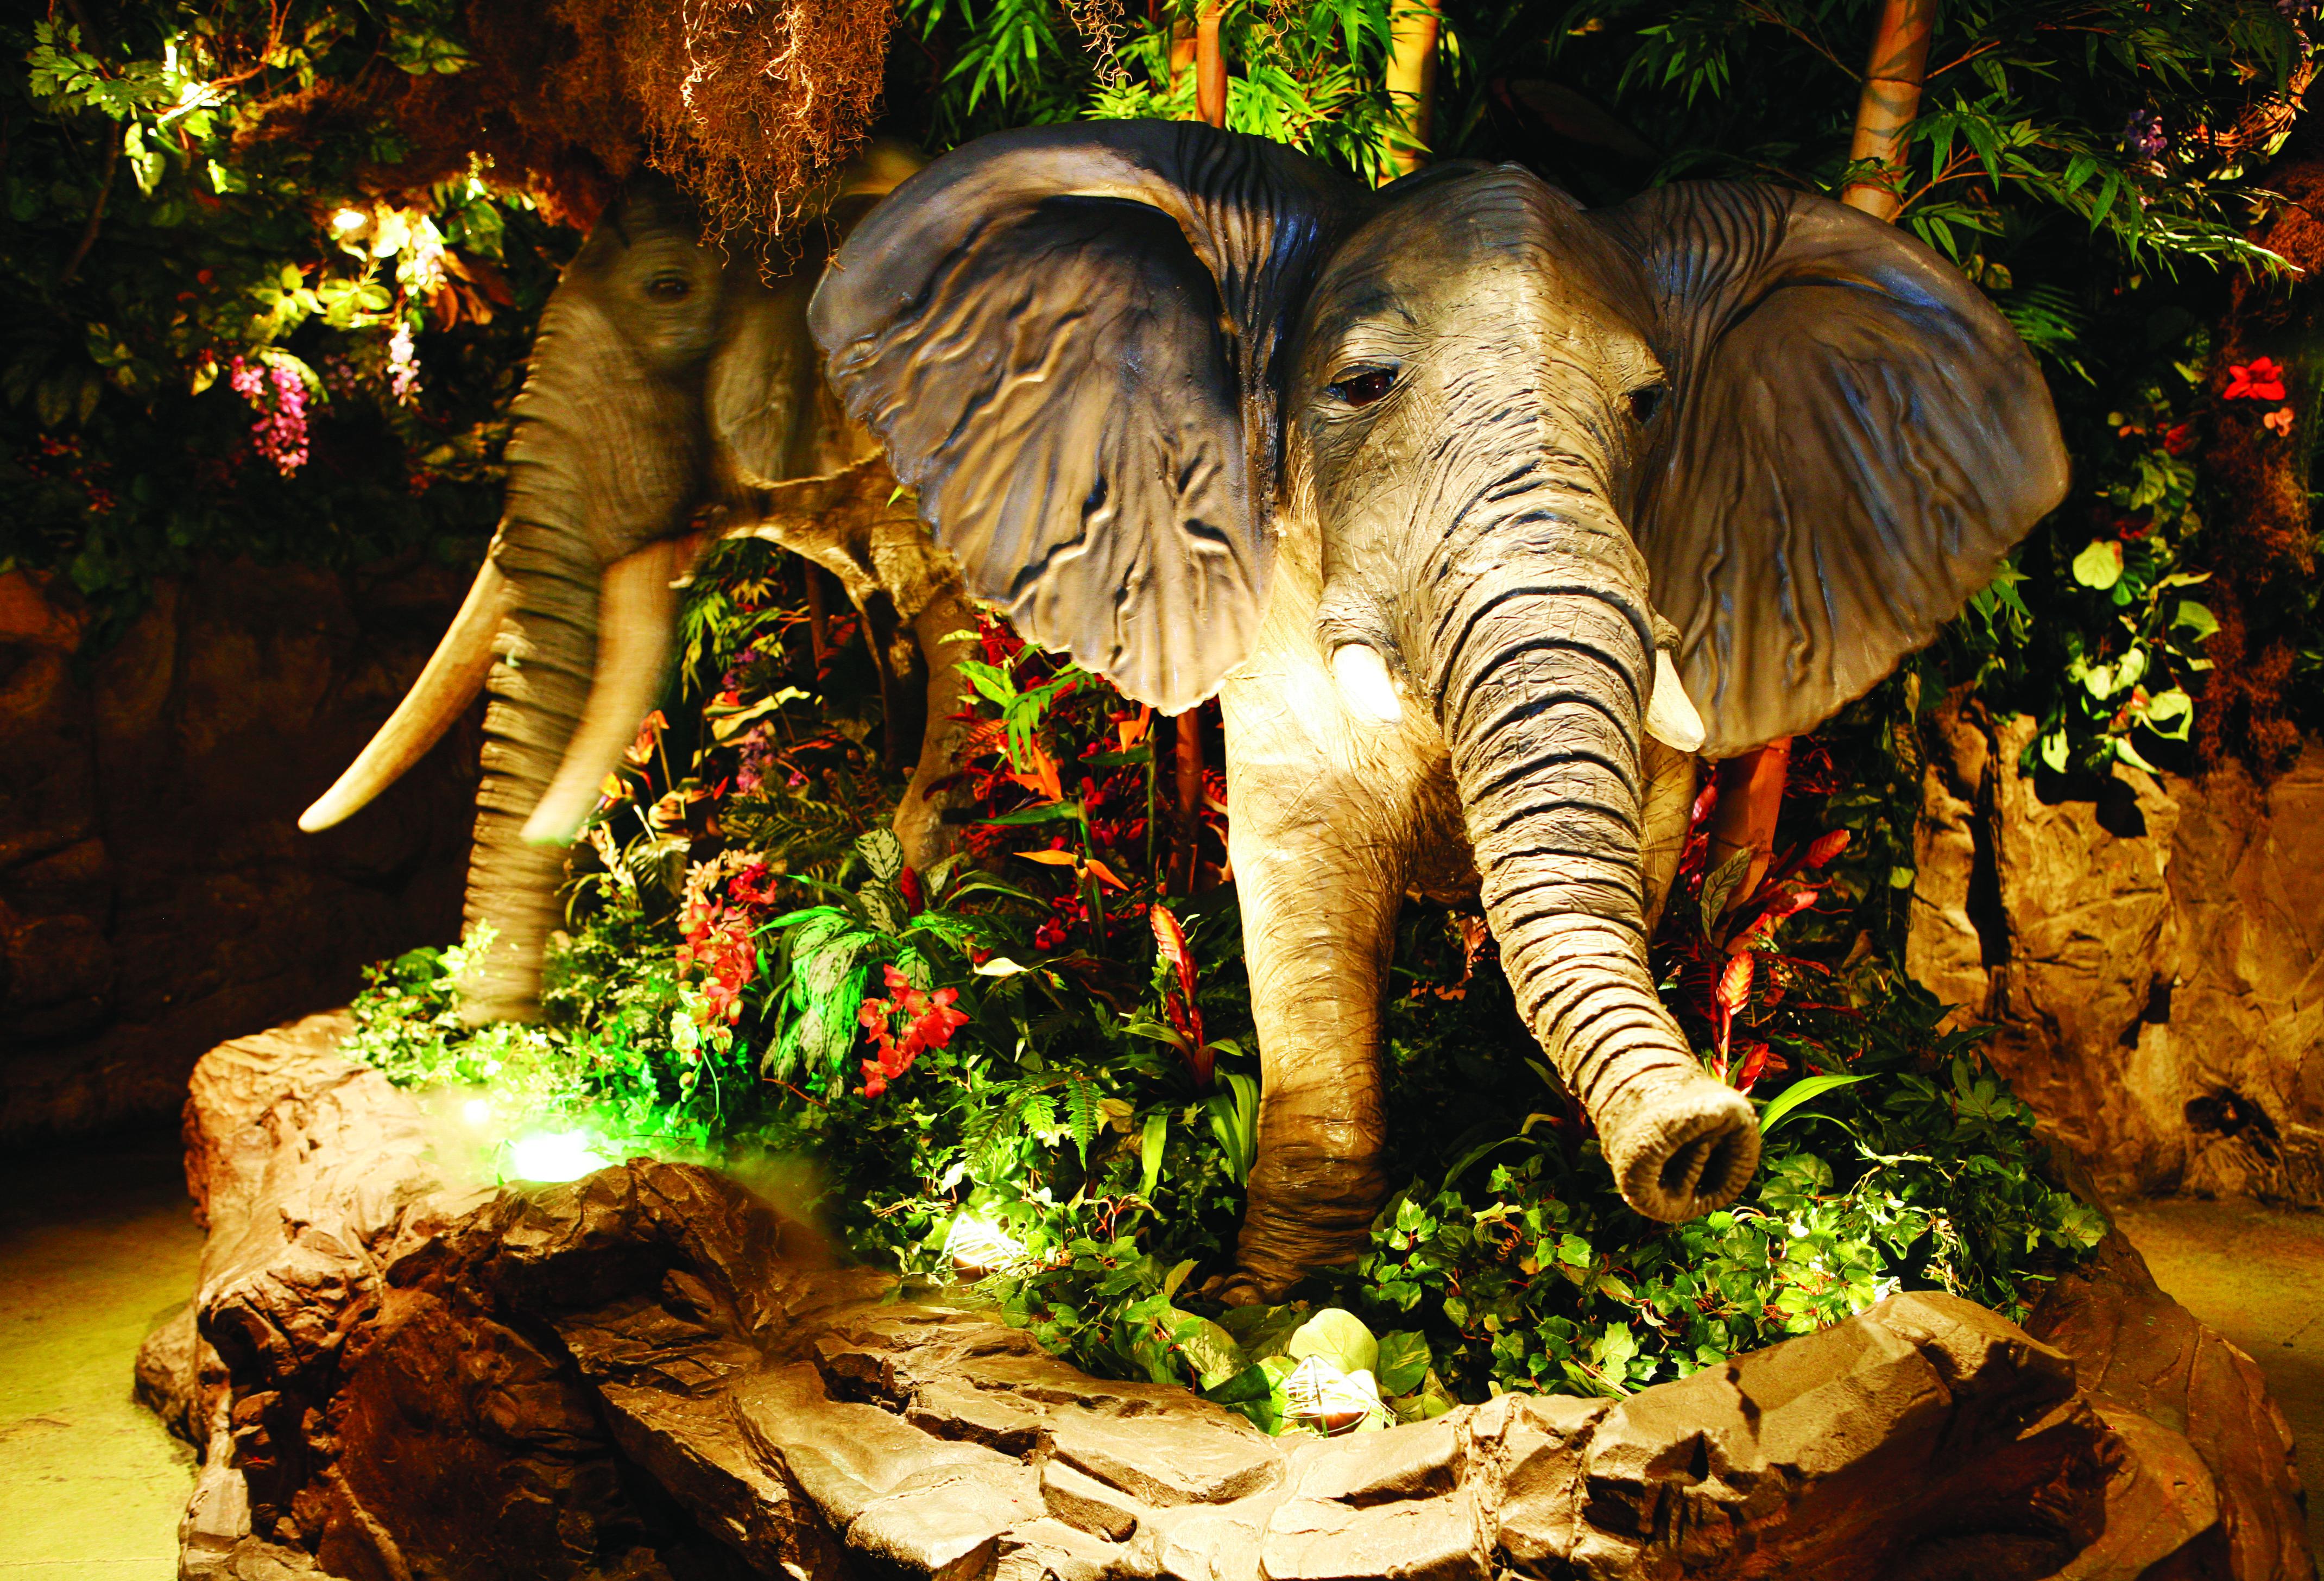 Rainforest Cafe Animal Kingdom Phone